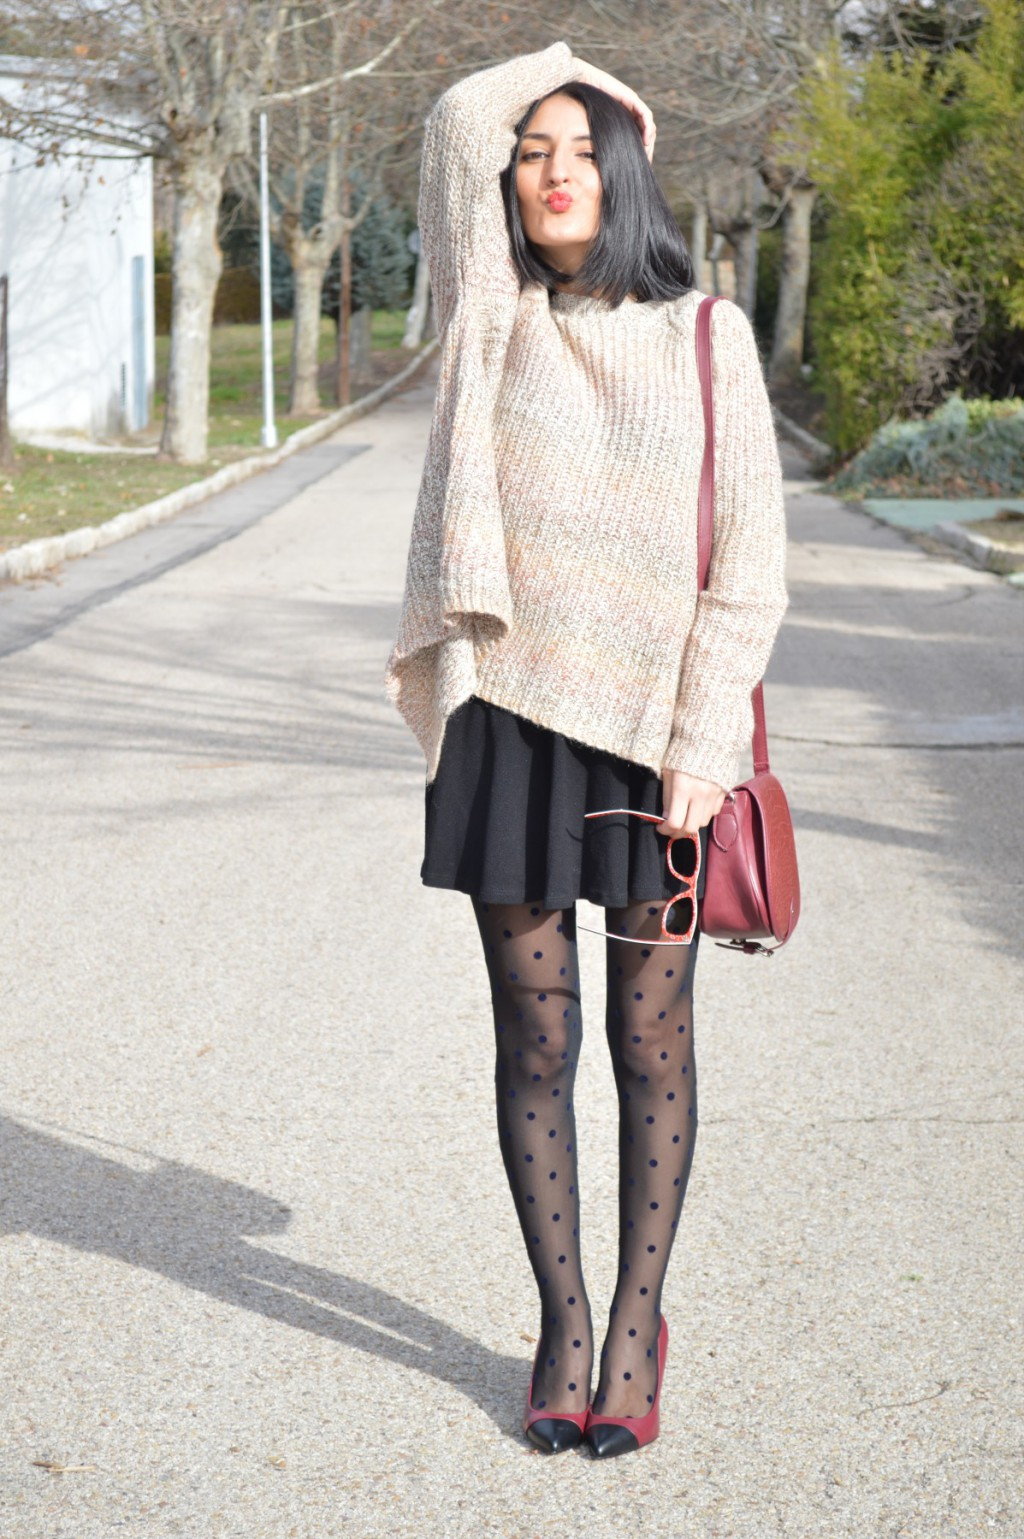 Jersey: Sfera Falda / skirt: Bershka Stilettos: Mango Medias / tights: Calzedonia Bolso / bag: Bershka Gafas de sol / sunglasses: Ray ban